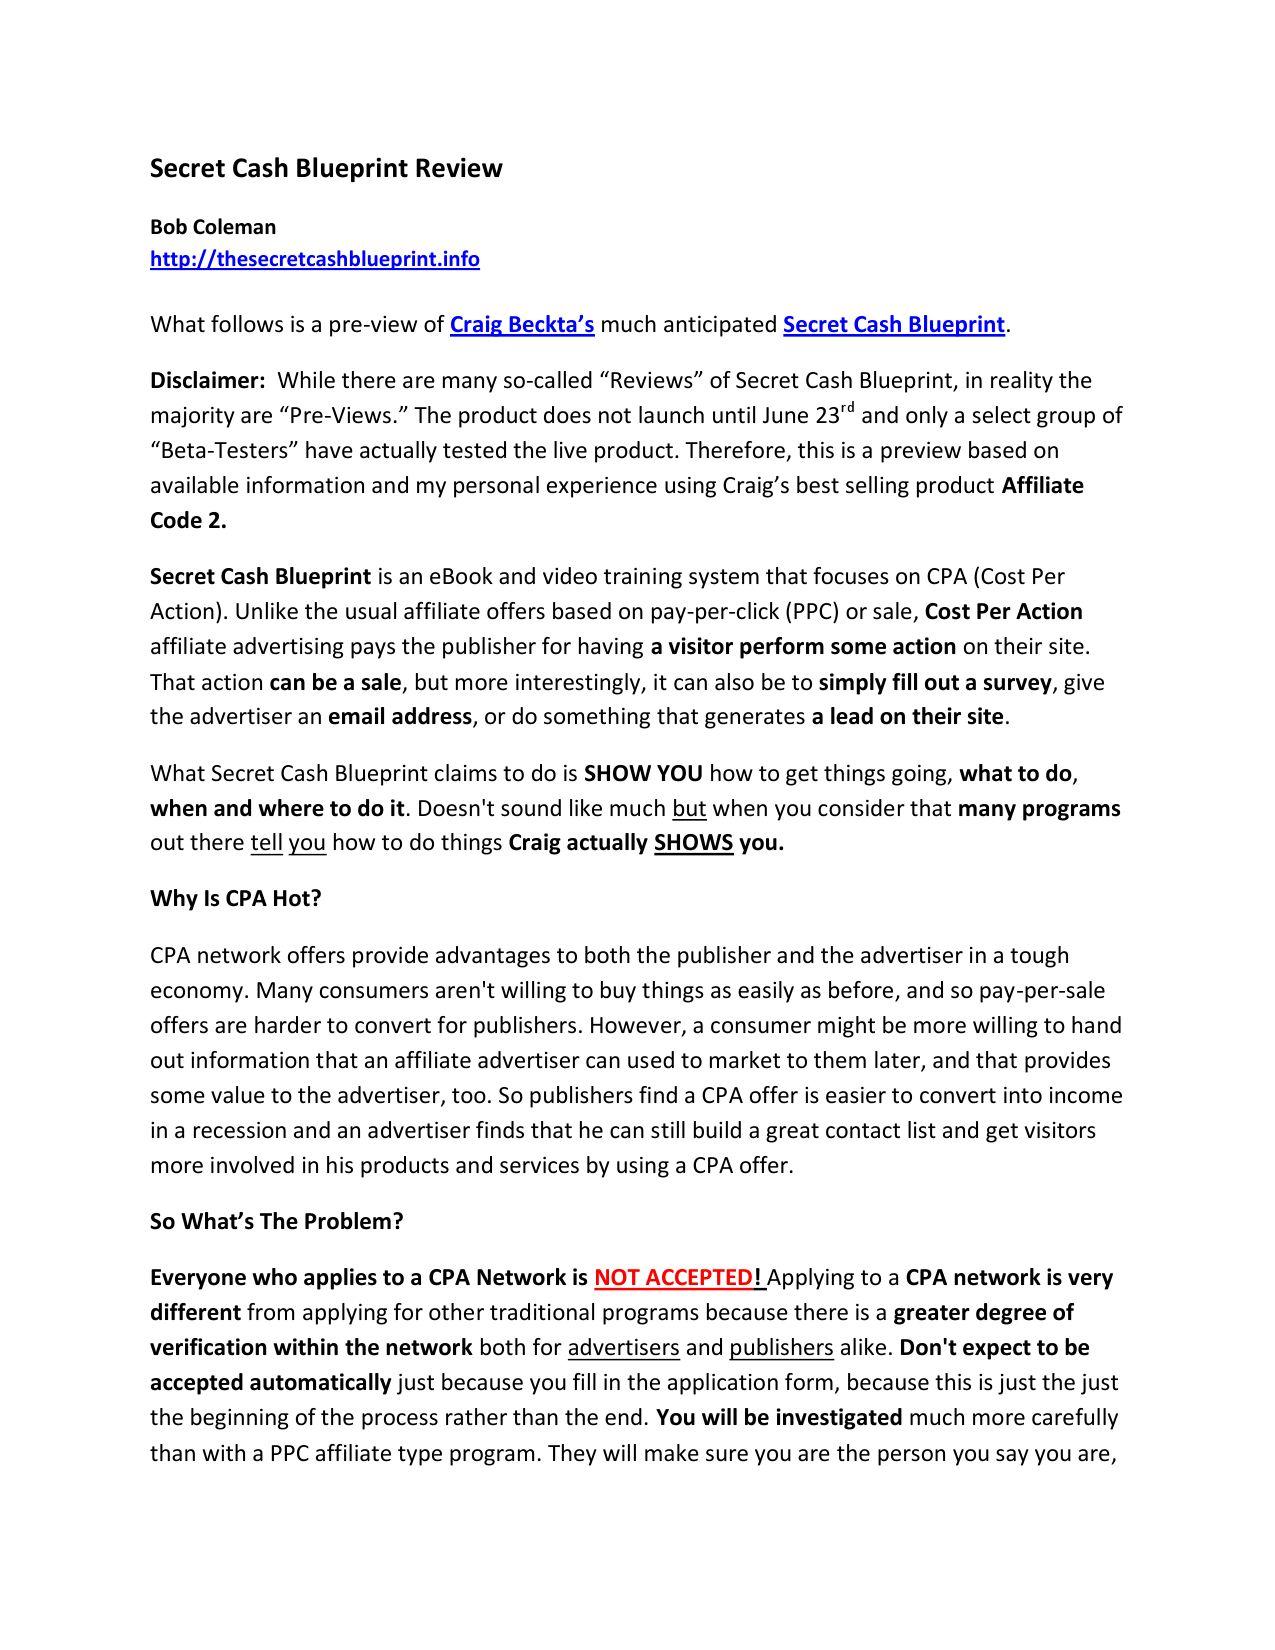 Secret cash blueprint review by bob coleman issuu malvernweather Images